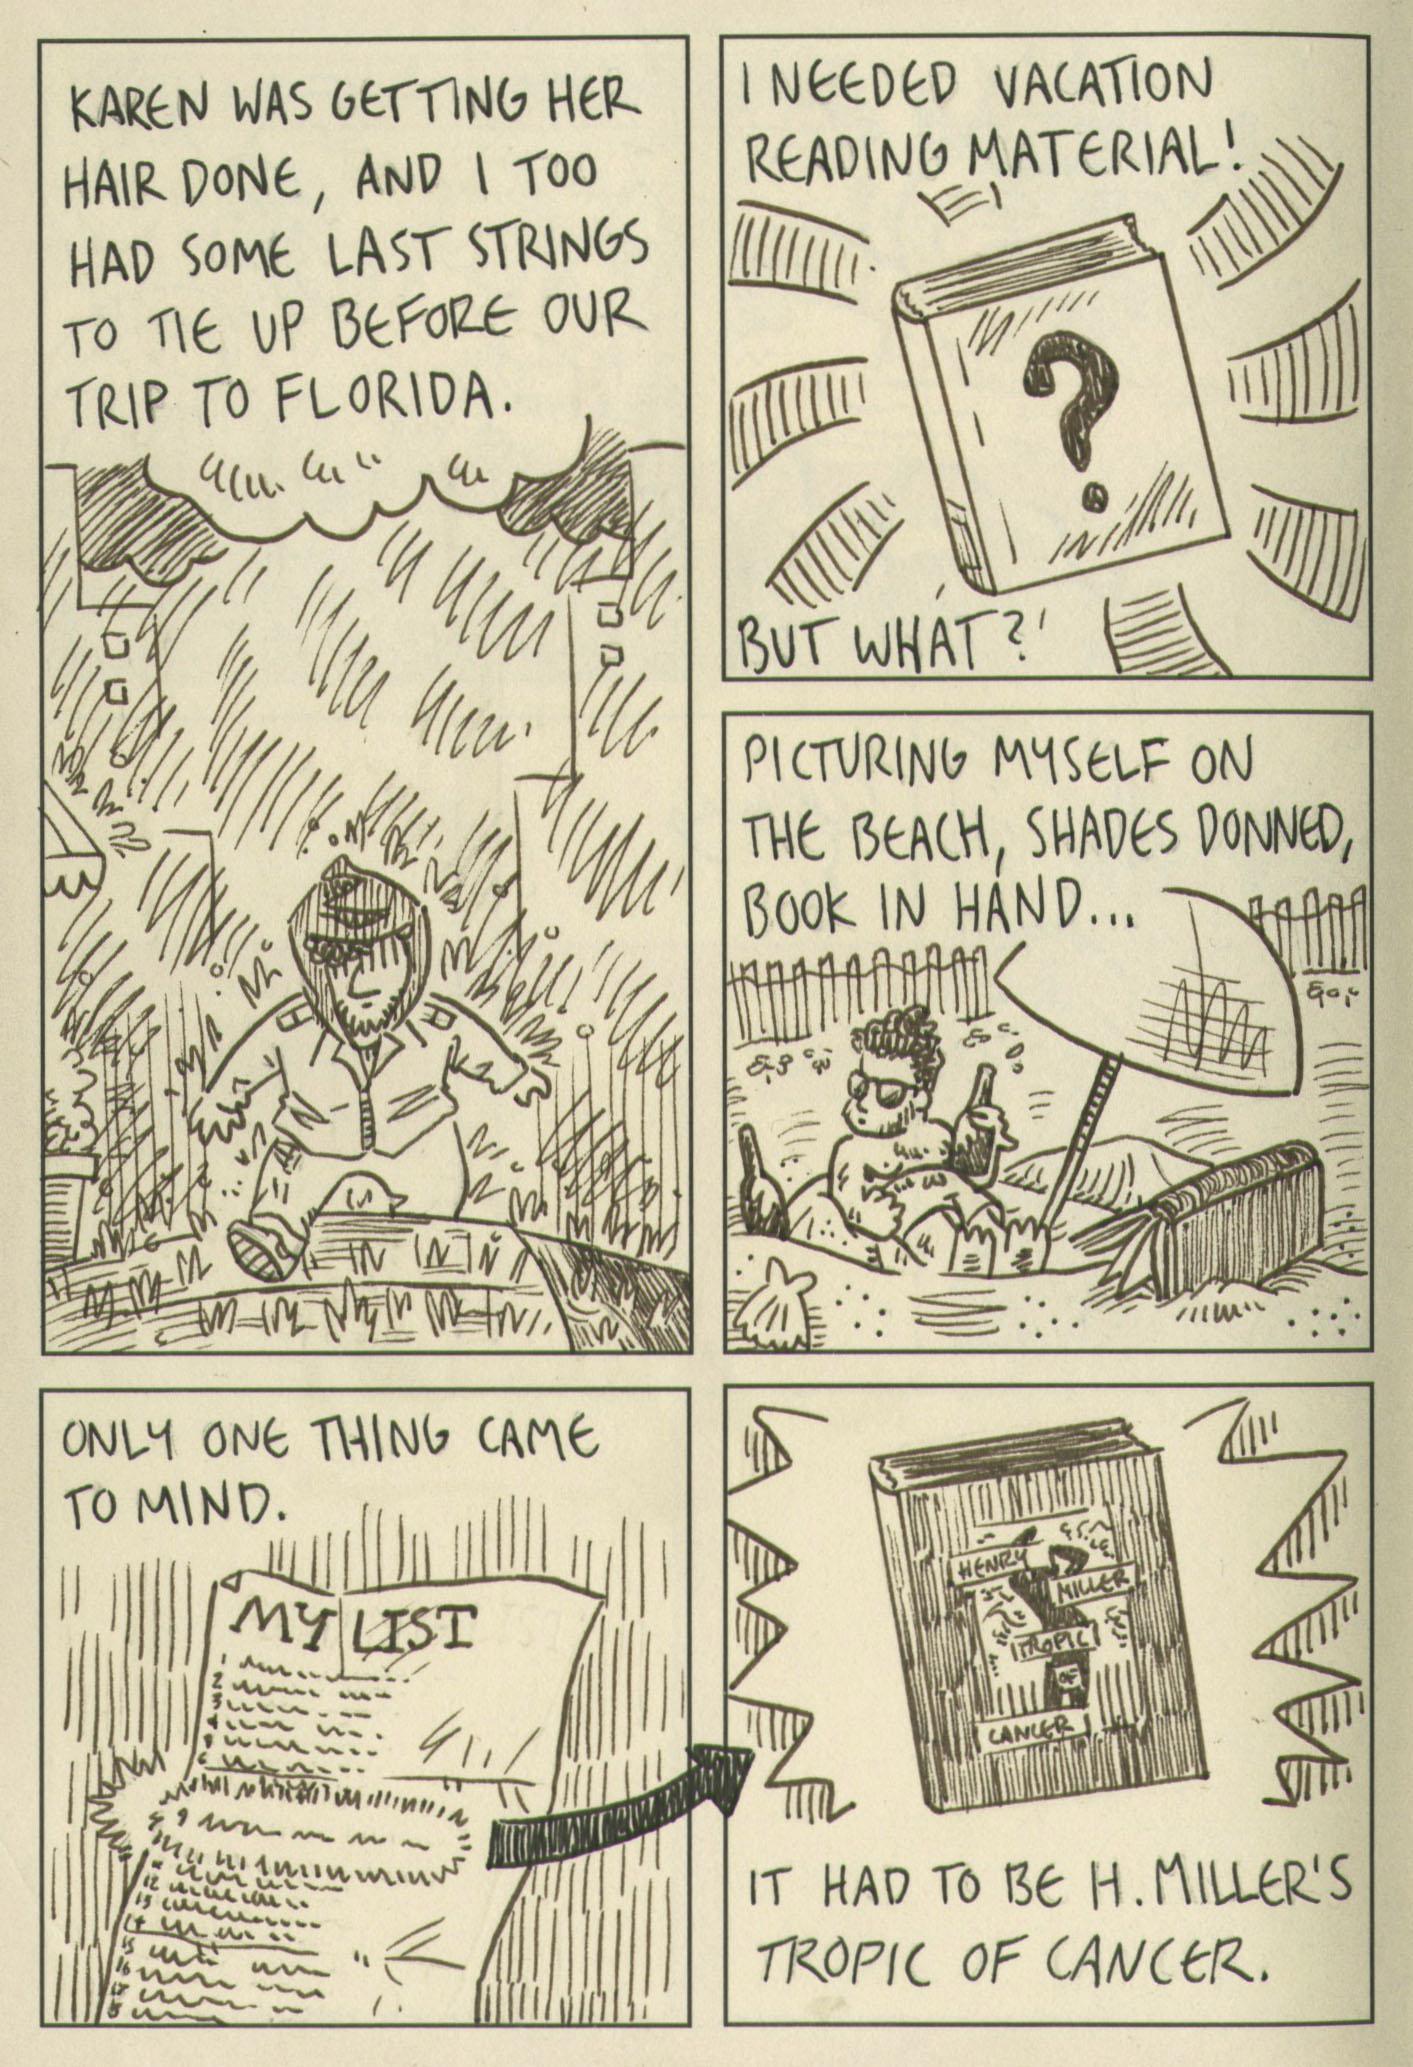 Florida (page1)